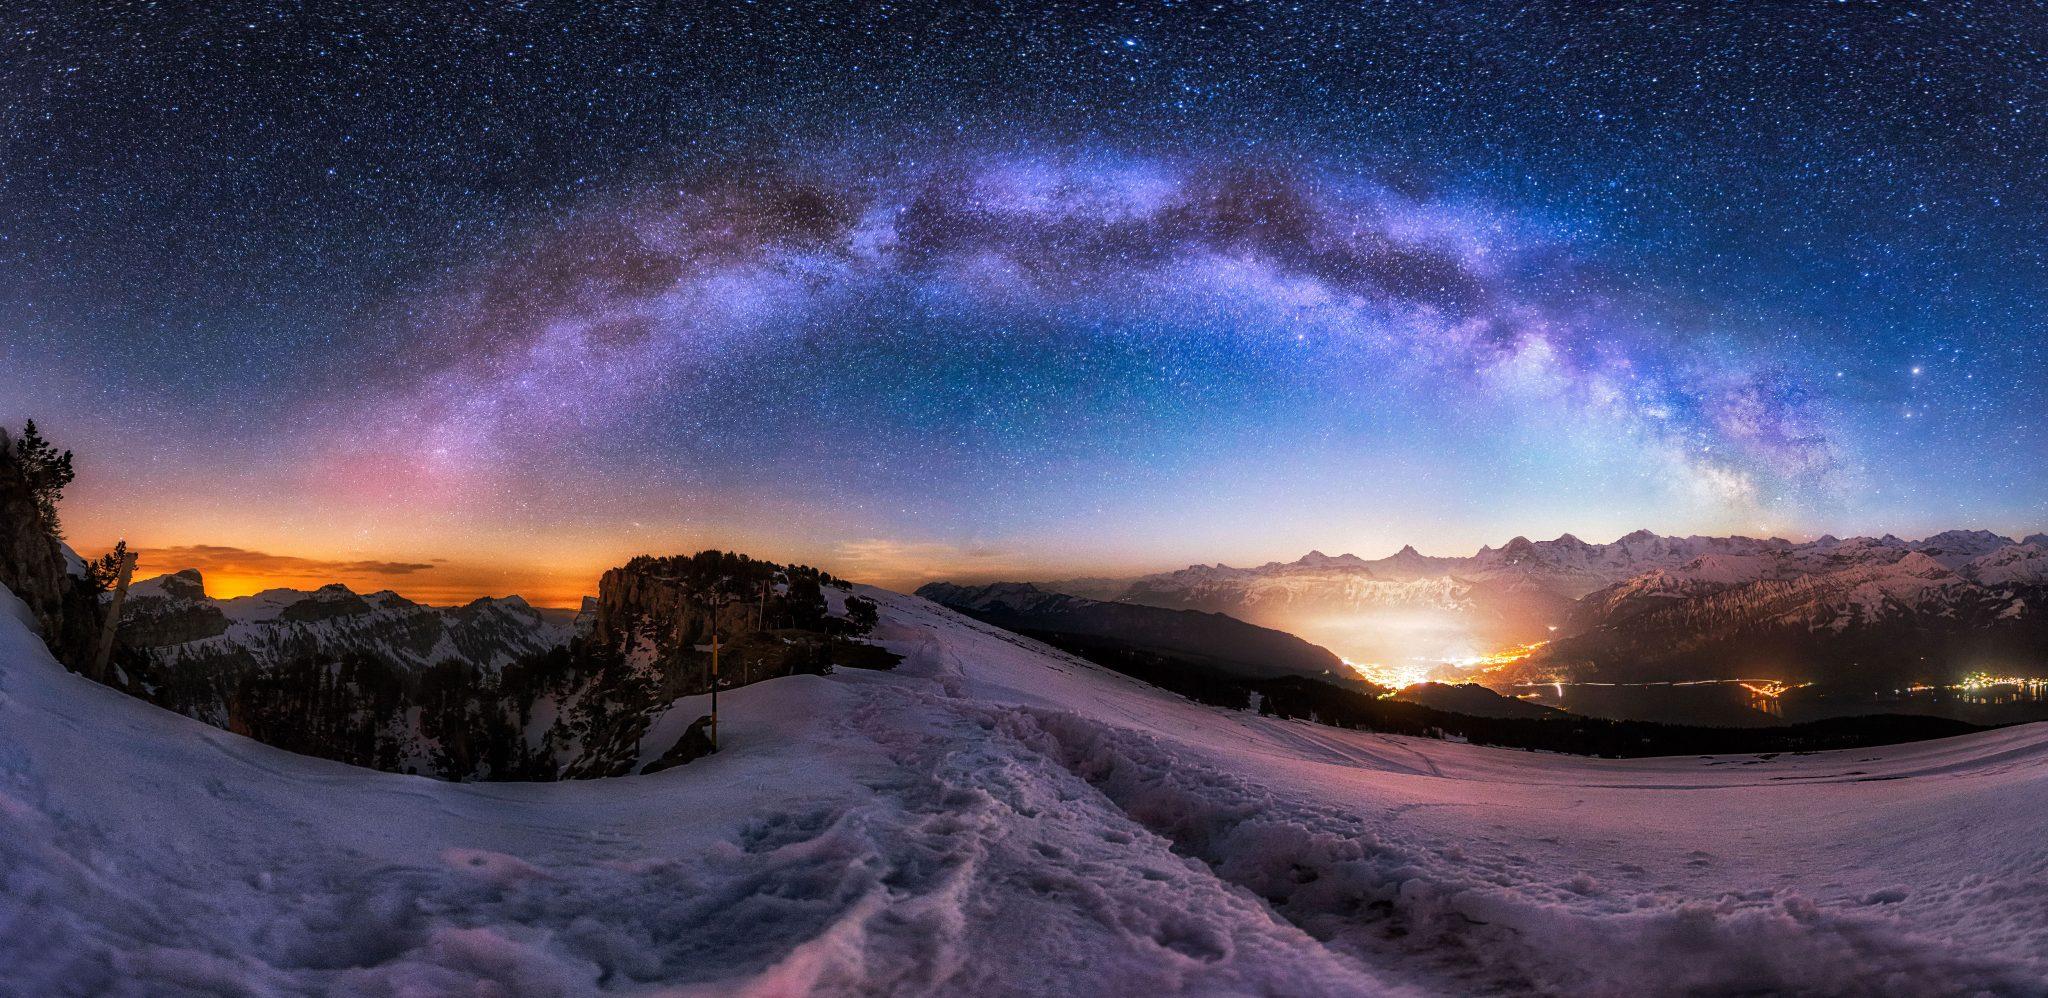 Milky Way - Bilder Als Leinwand  Alu-dibond